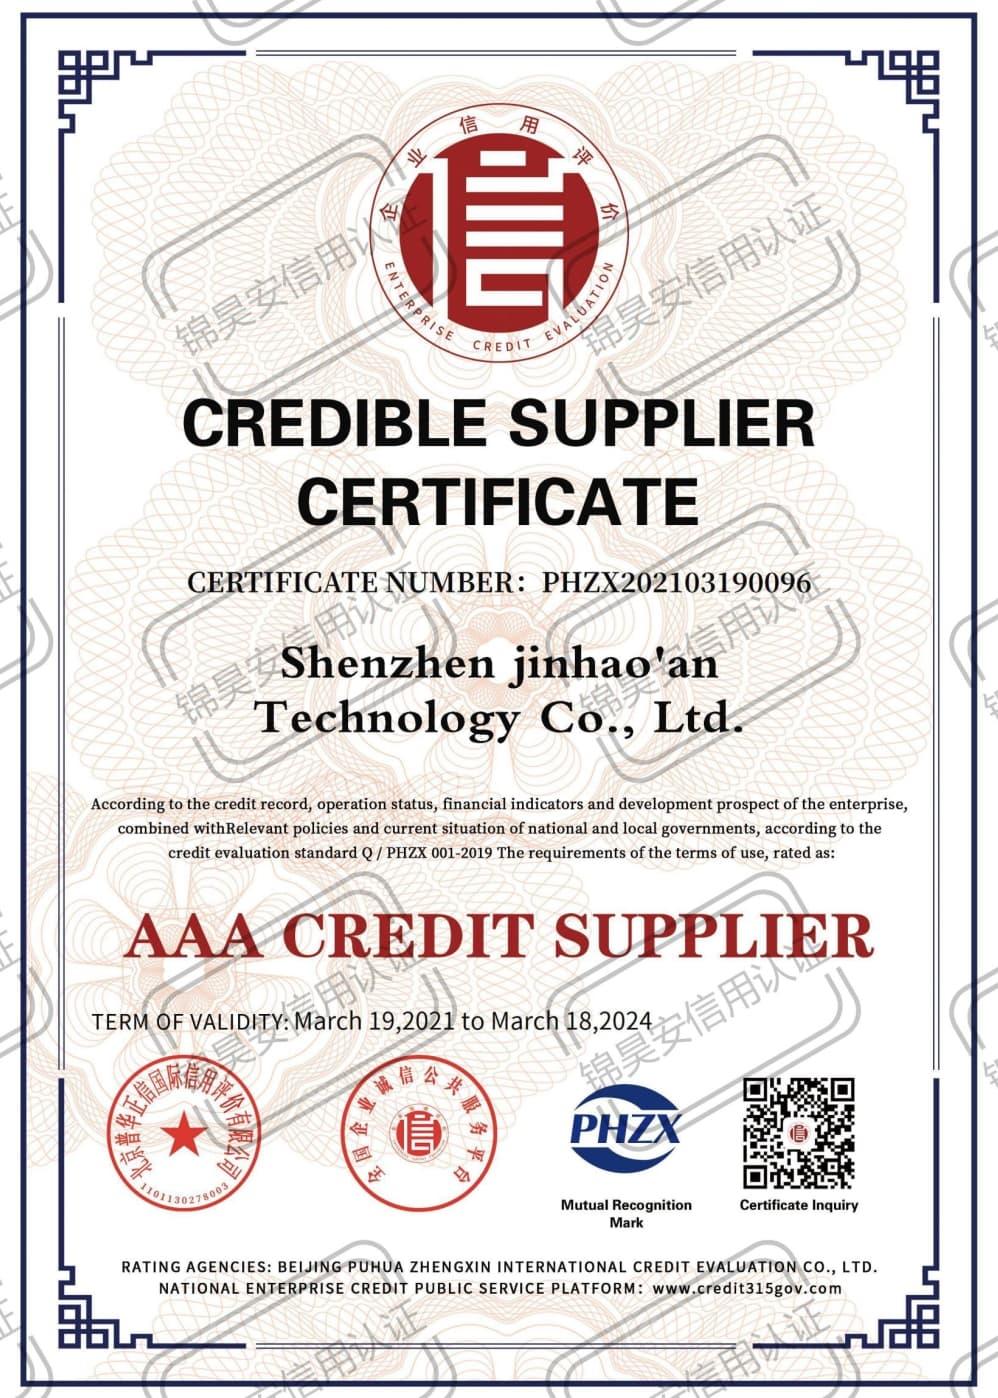 Credible Supplier Certificate